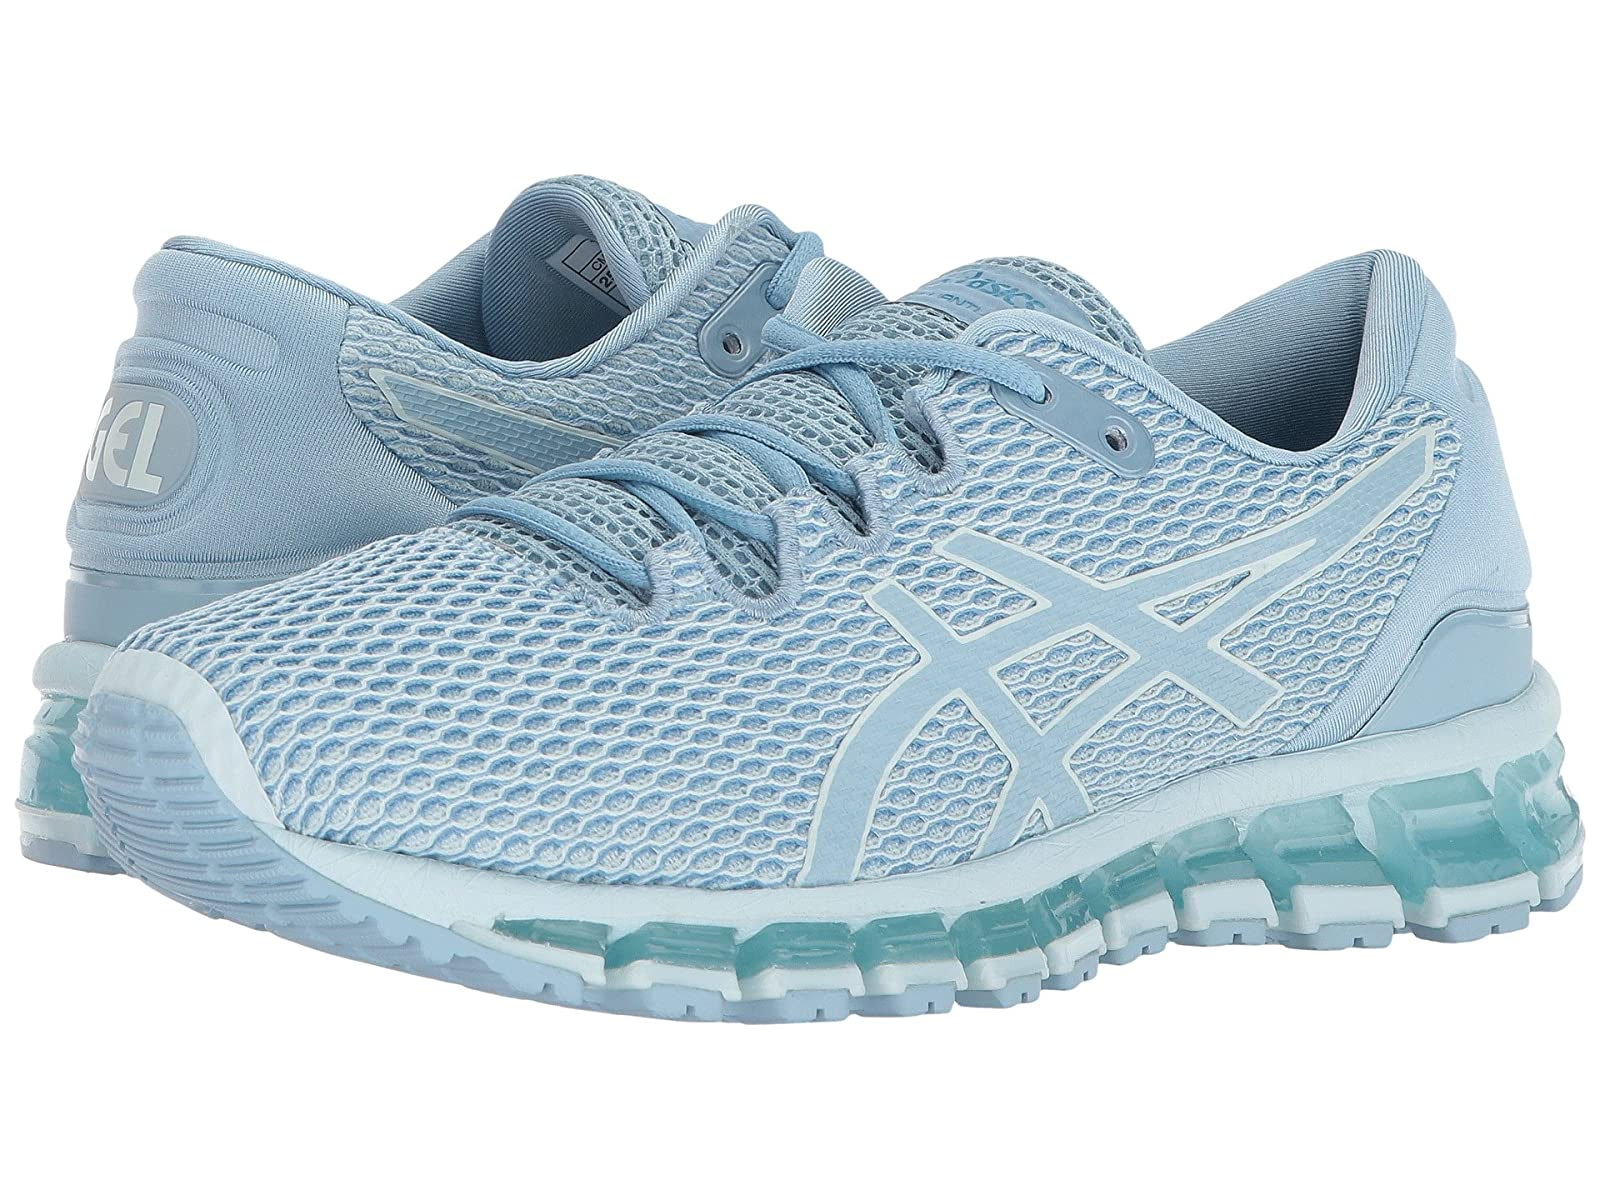 ASICS GEL-Quantum 360 Shift MXAtmospheric grades have affordable shoes